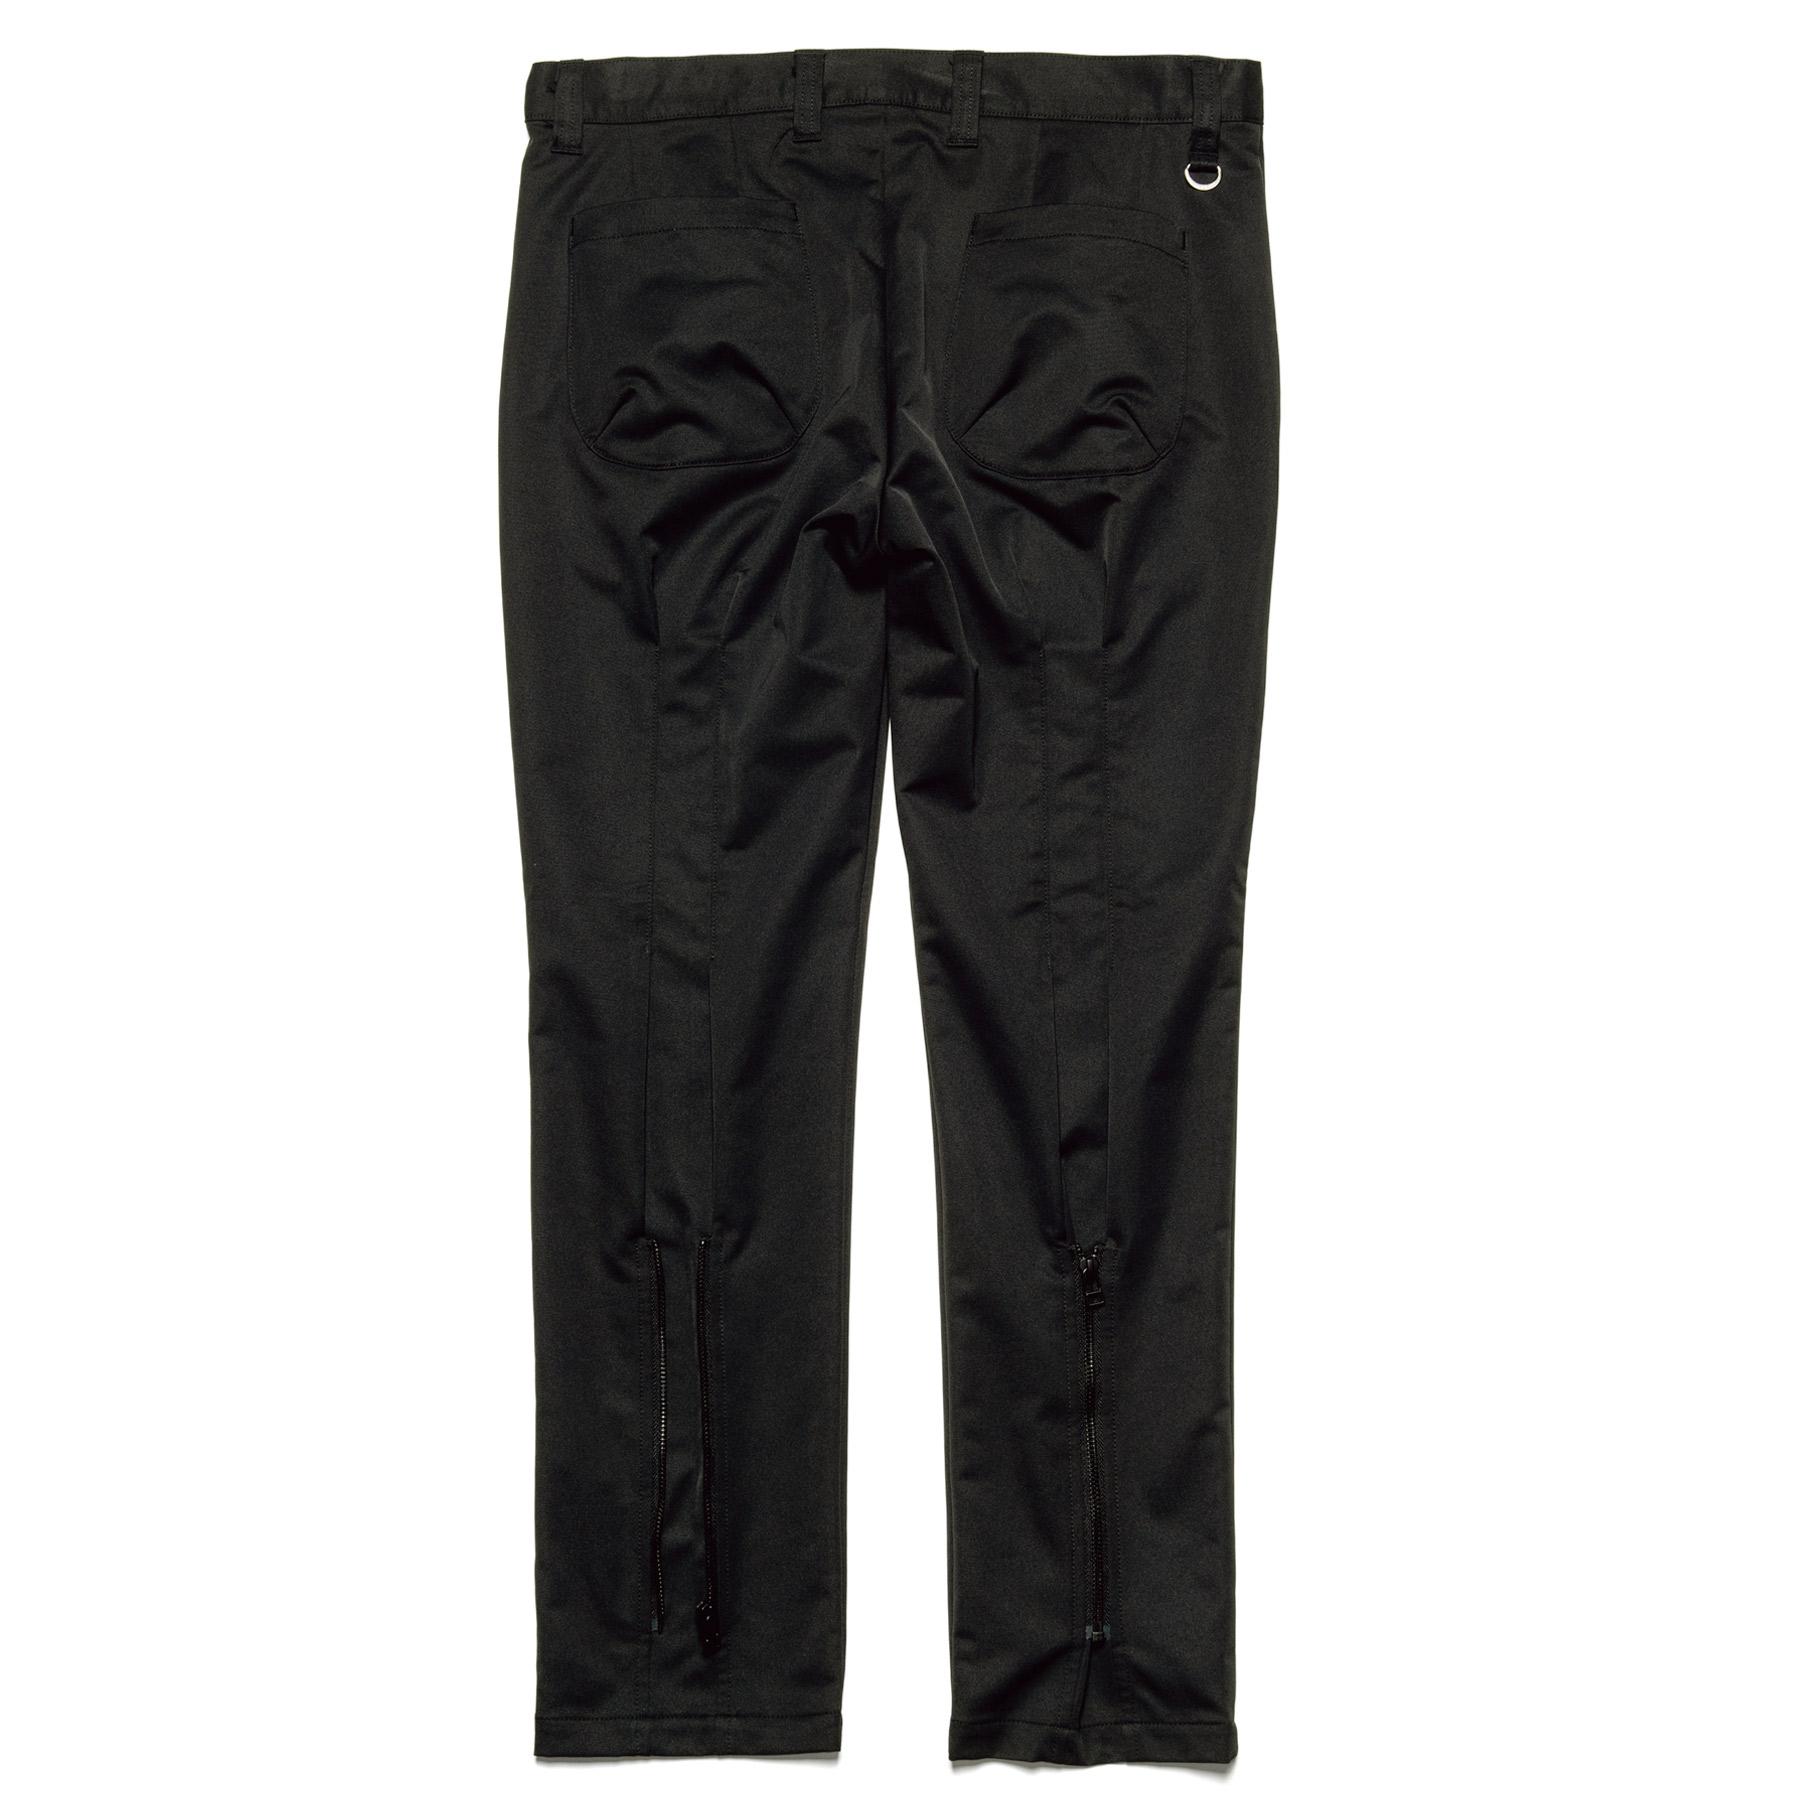 uniform experiment / SOLOTEX DRY STRETCH TWILL BACK ZIP PANTS (Black)